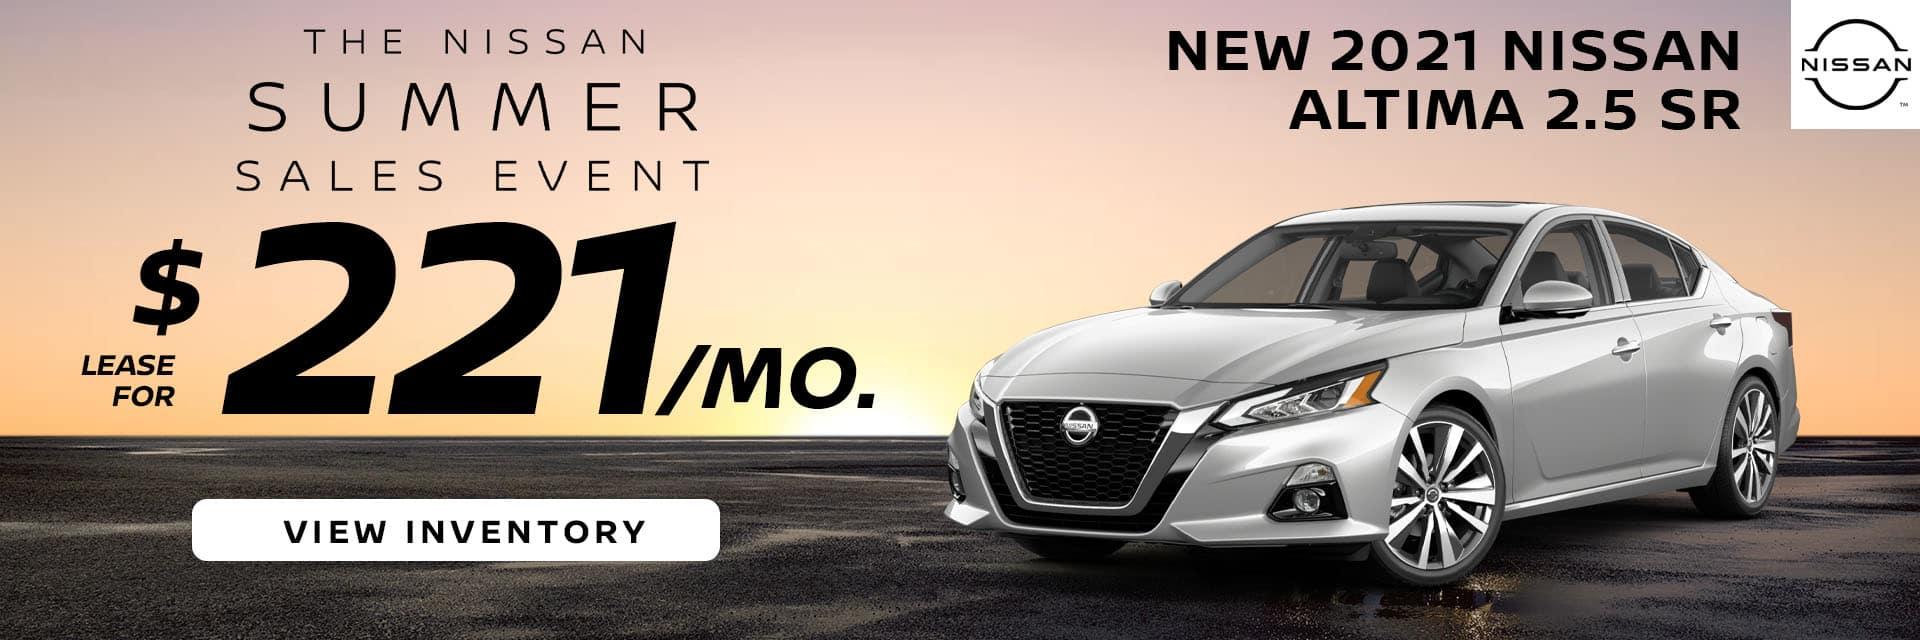 CNSN-June 2021-2021 Nissan Altima copy